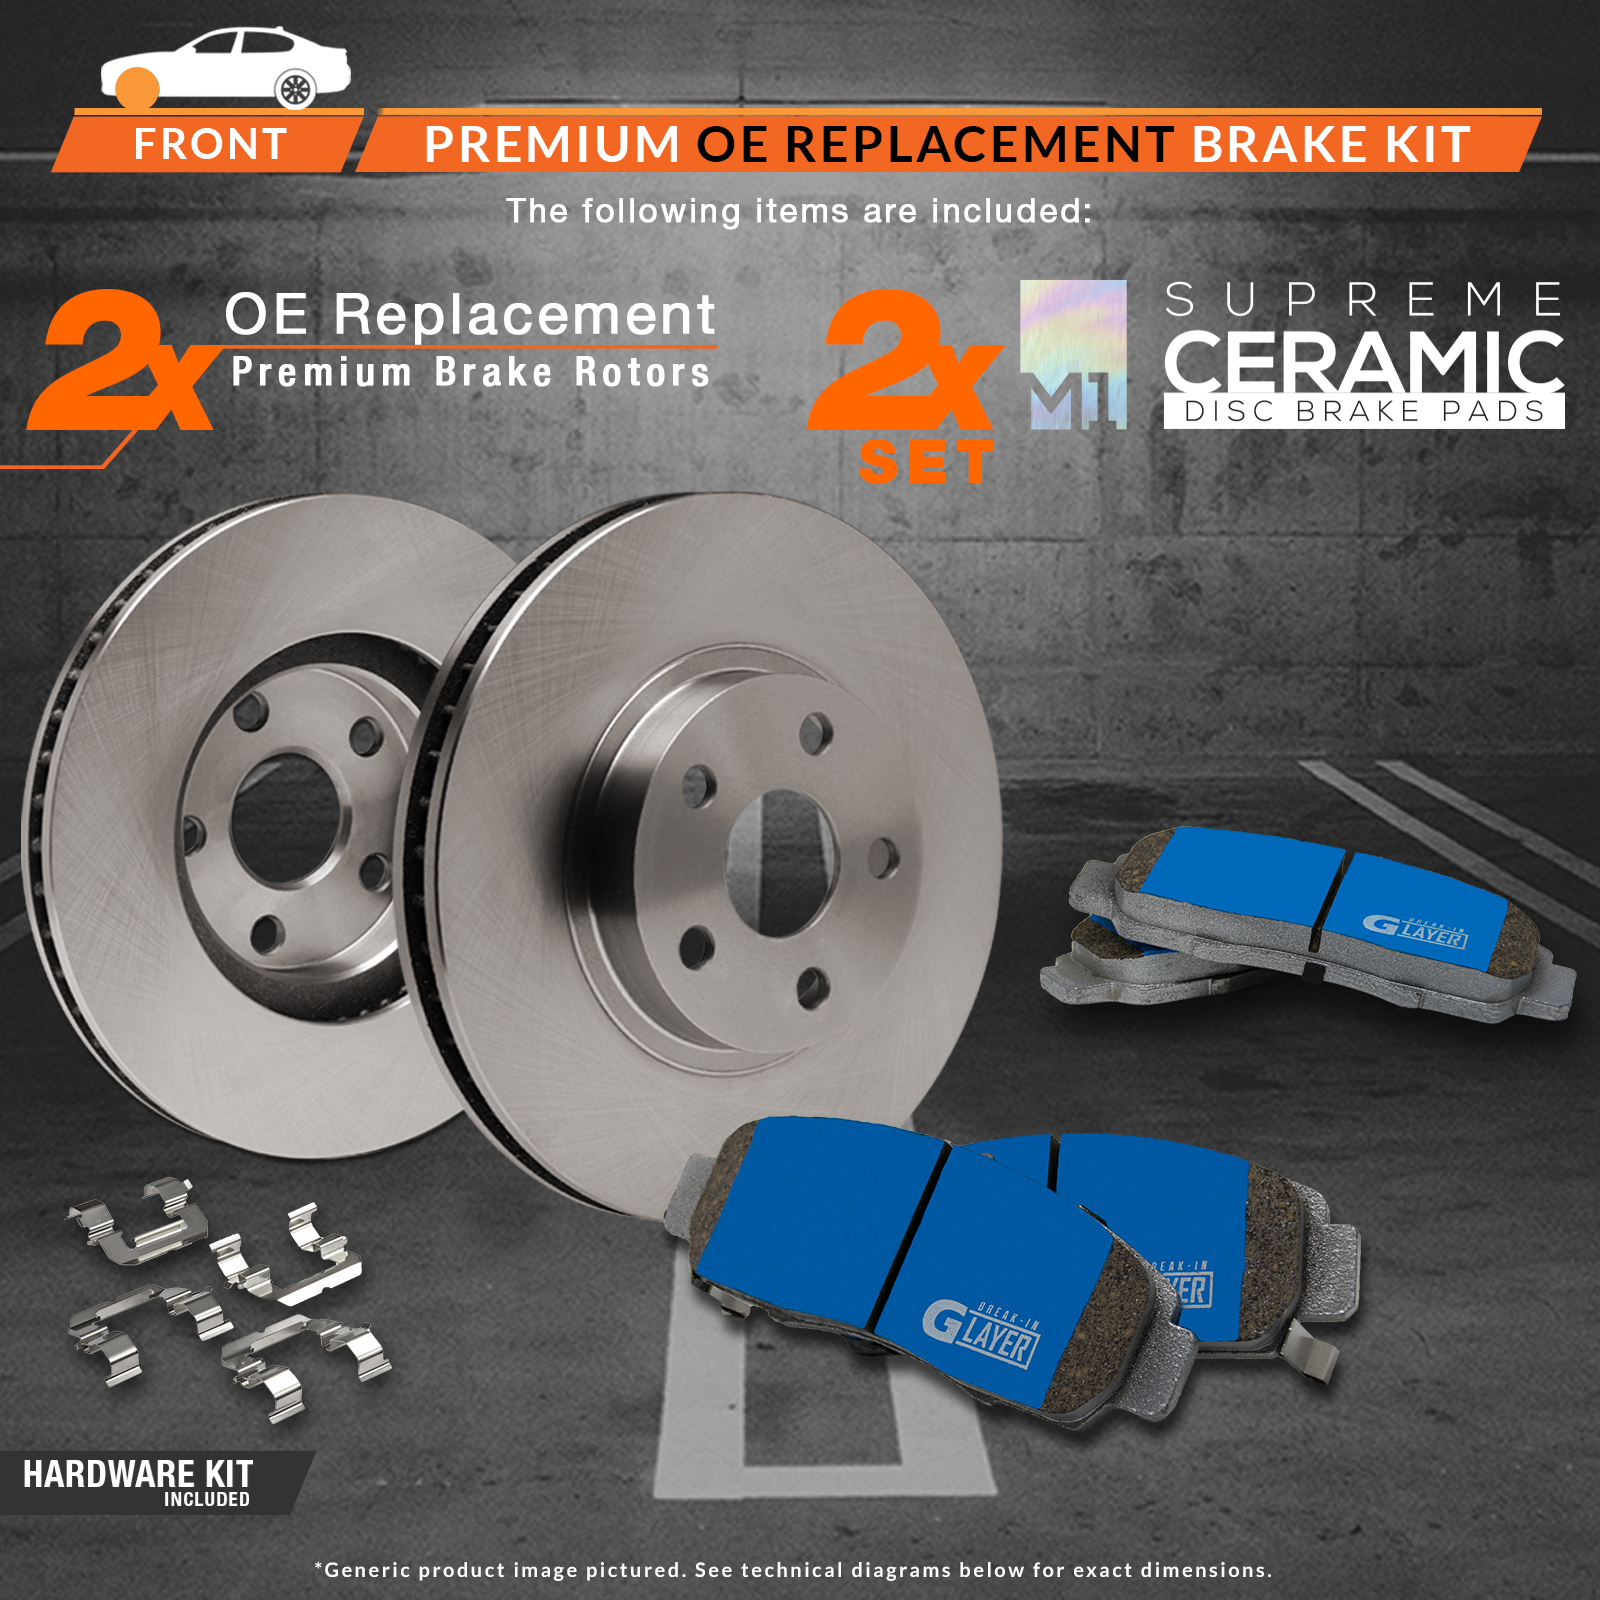 2008 2009 2010 2011 Mazda 3 2.0L OE Replacement Rotors M1 Ceramic Pads F